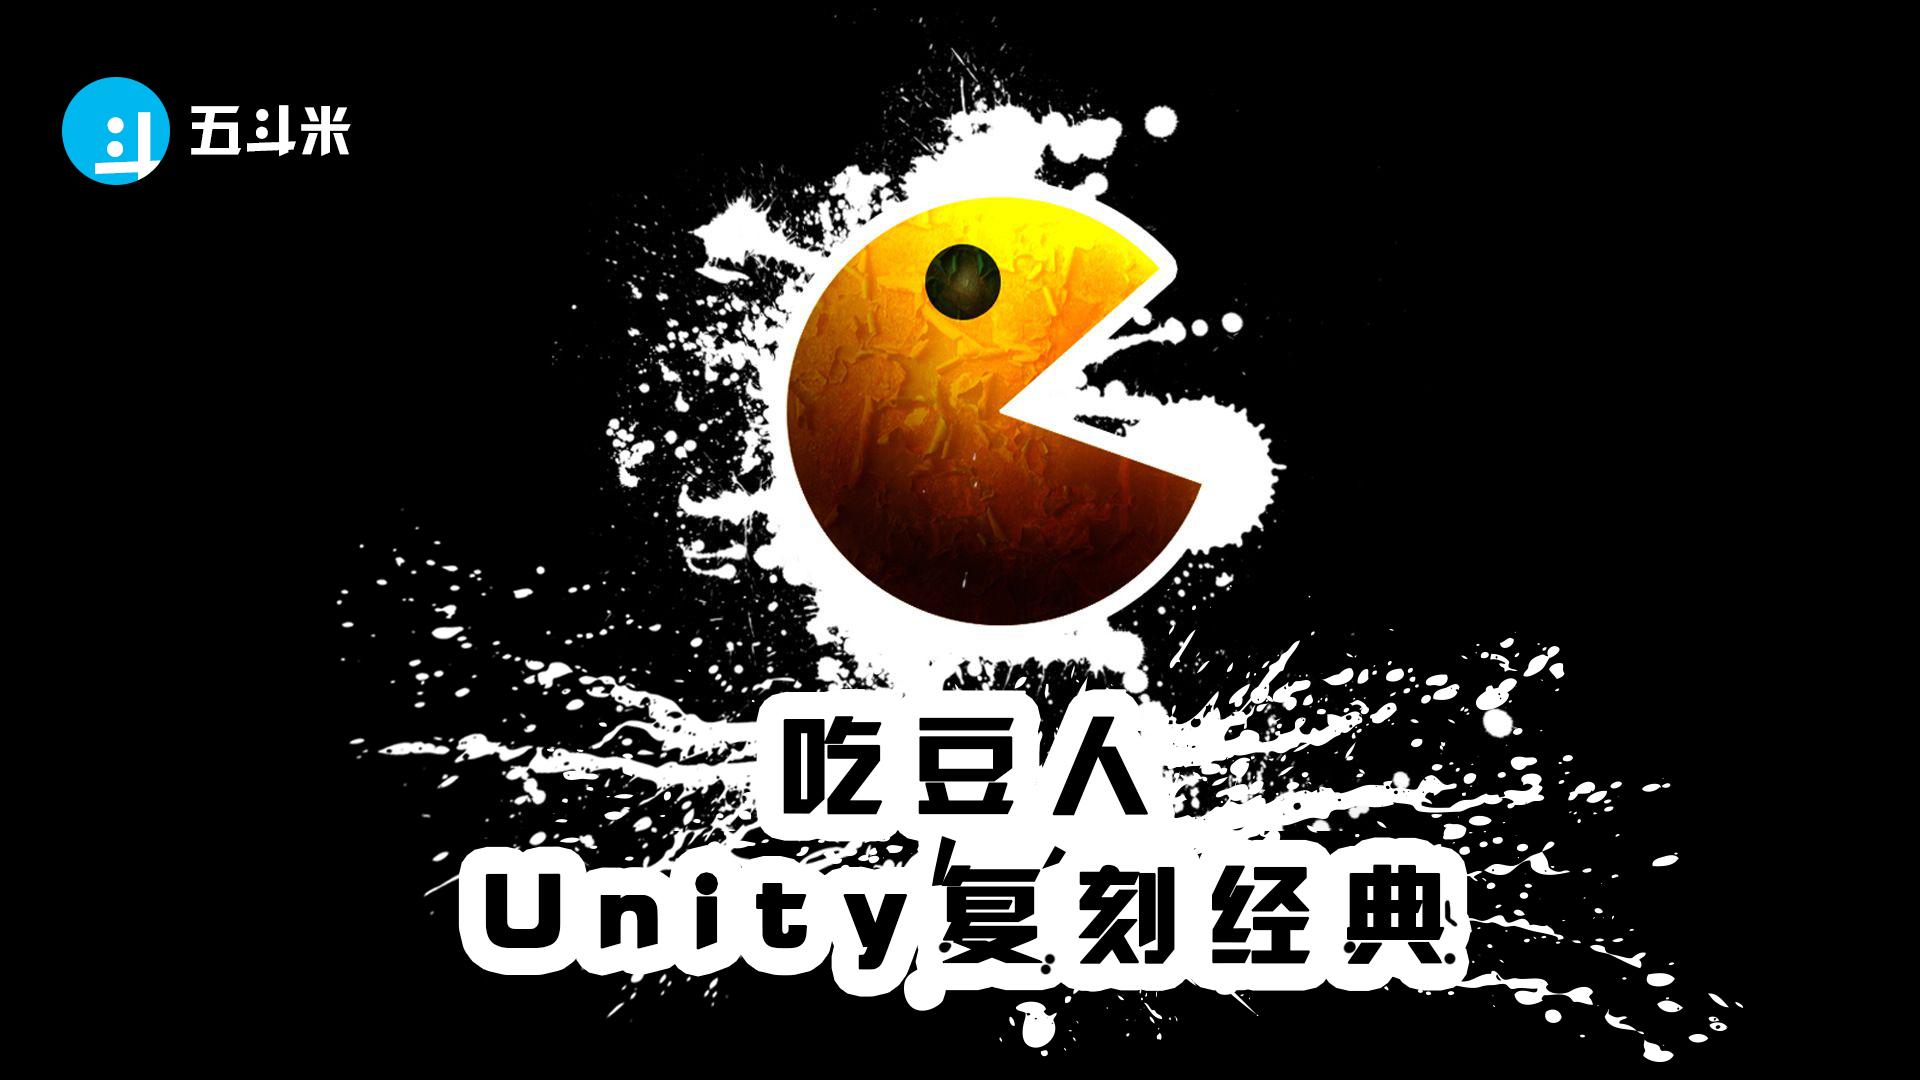 Unity复刻经典-吃豆人